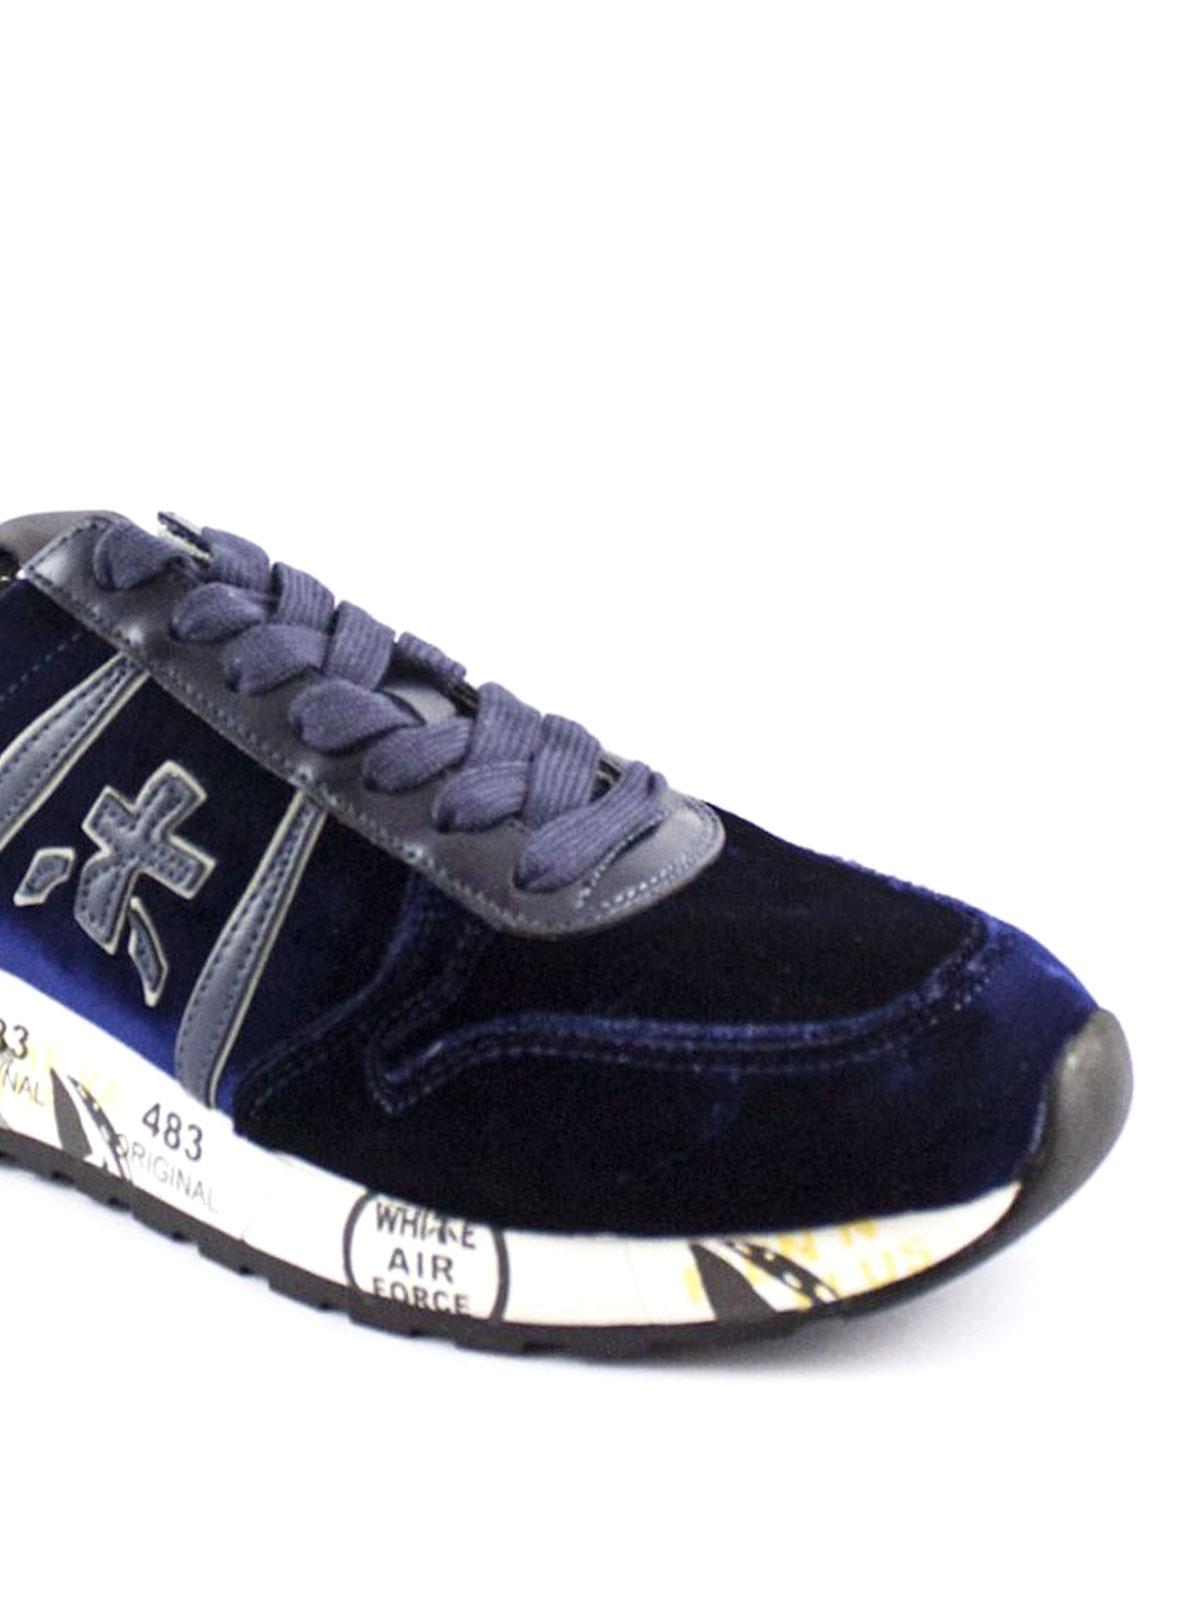 Premiata Sneaker Diane 2633 in velluto sneakers DIANE2633